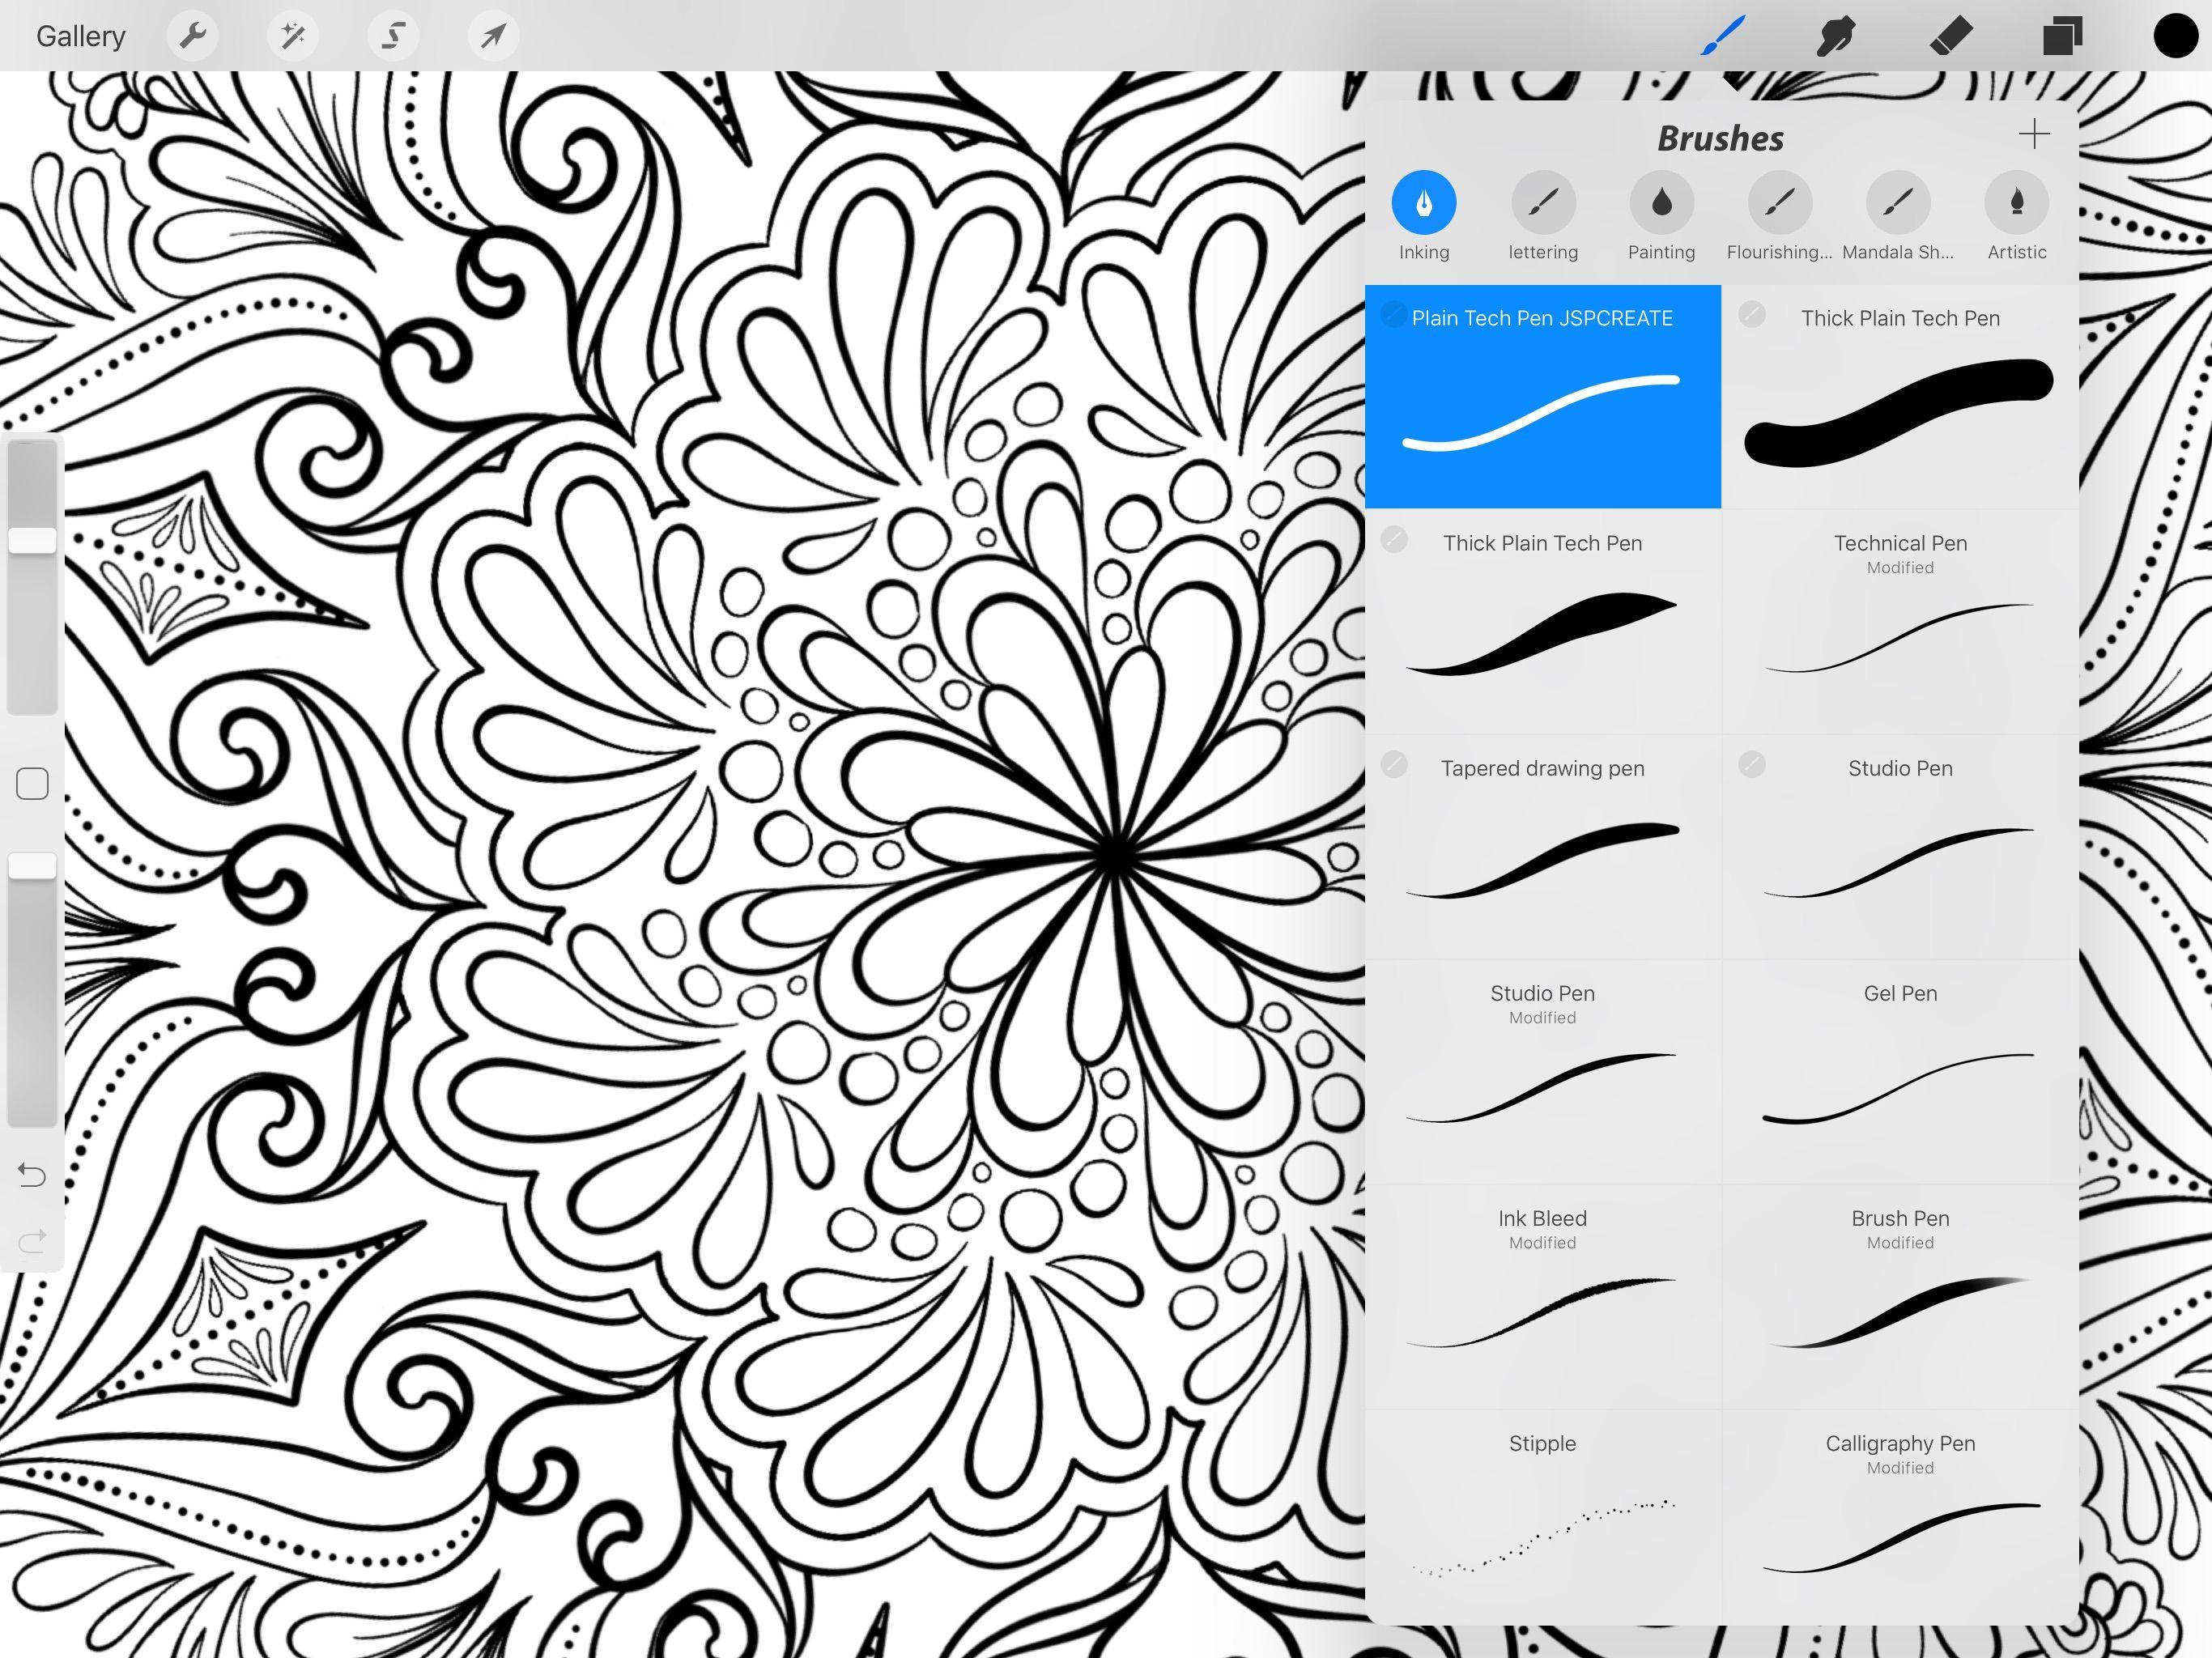 Procreate Coloring Pages Free - Lautigamu